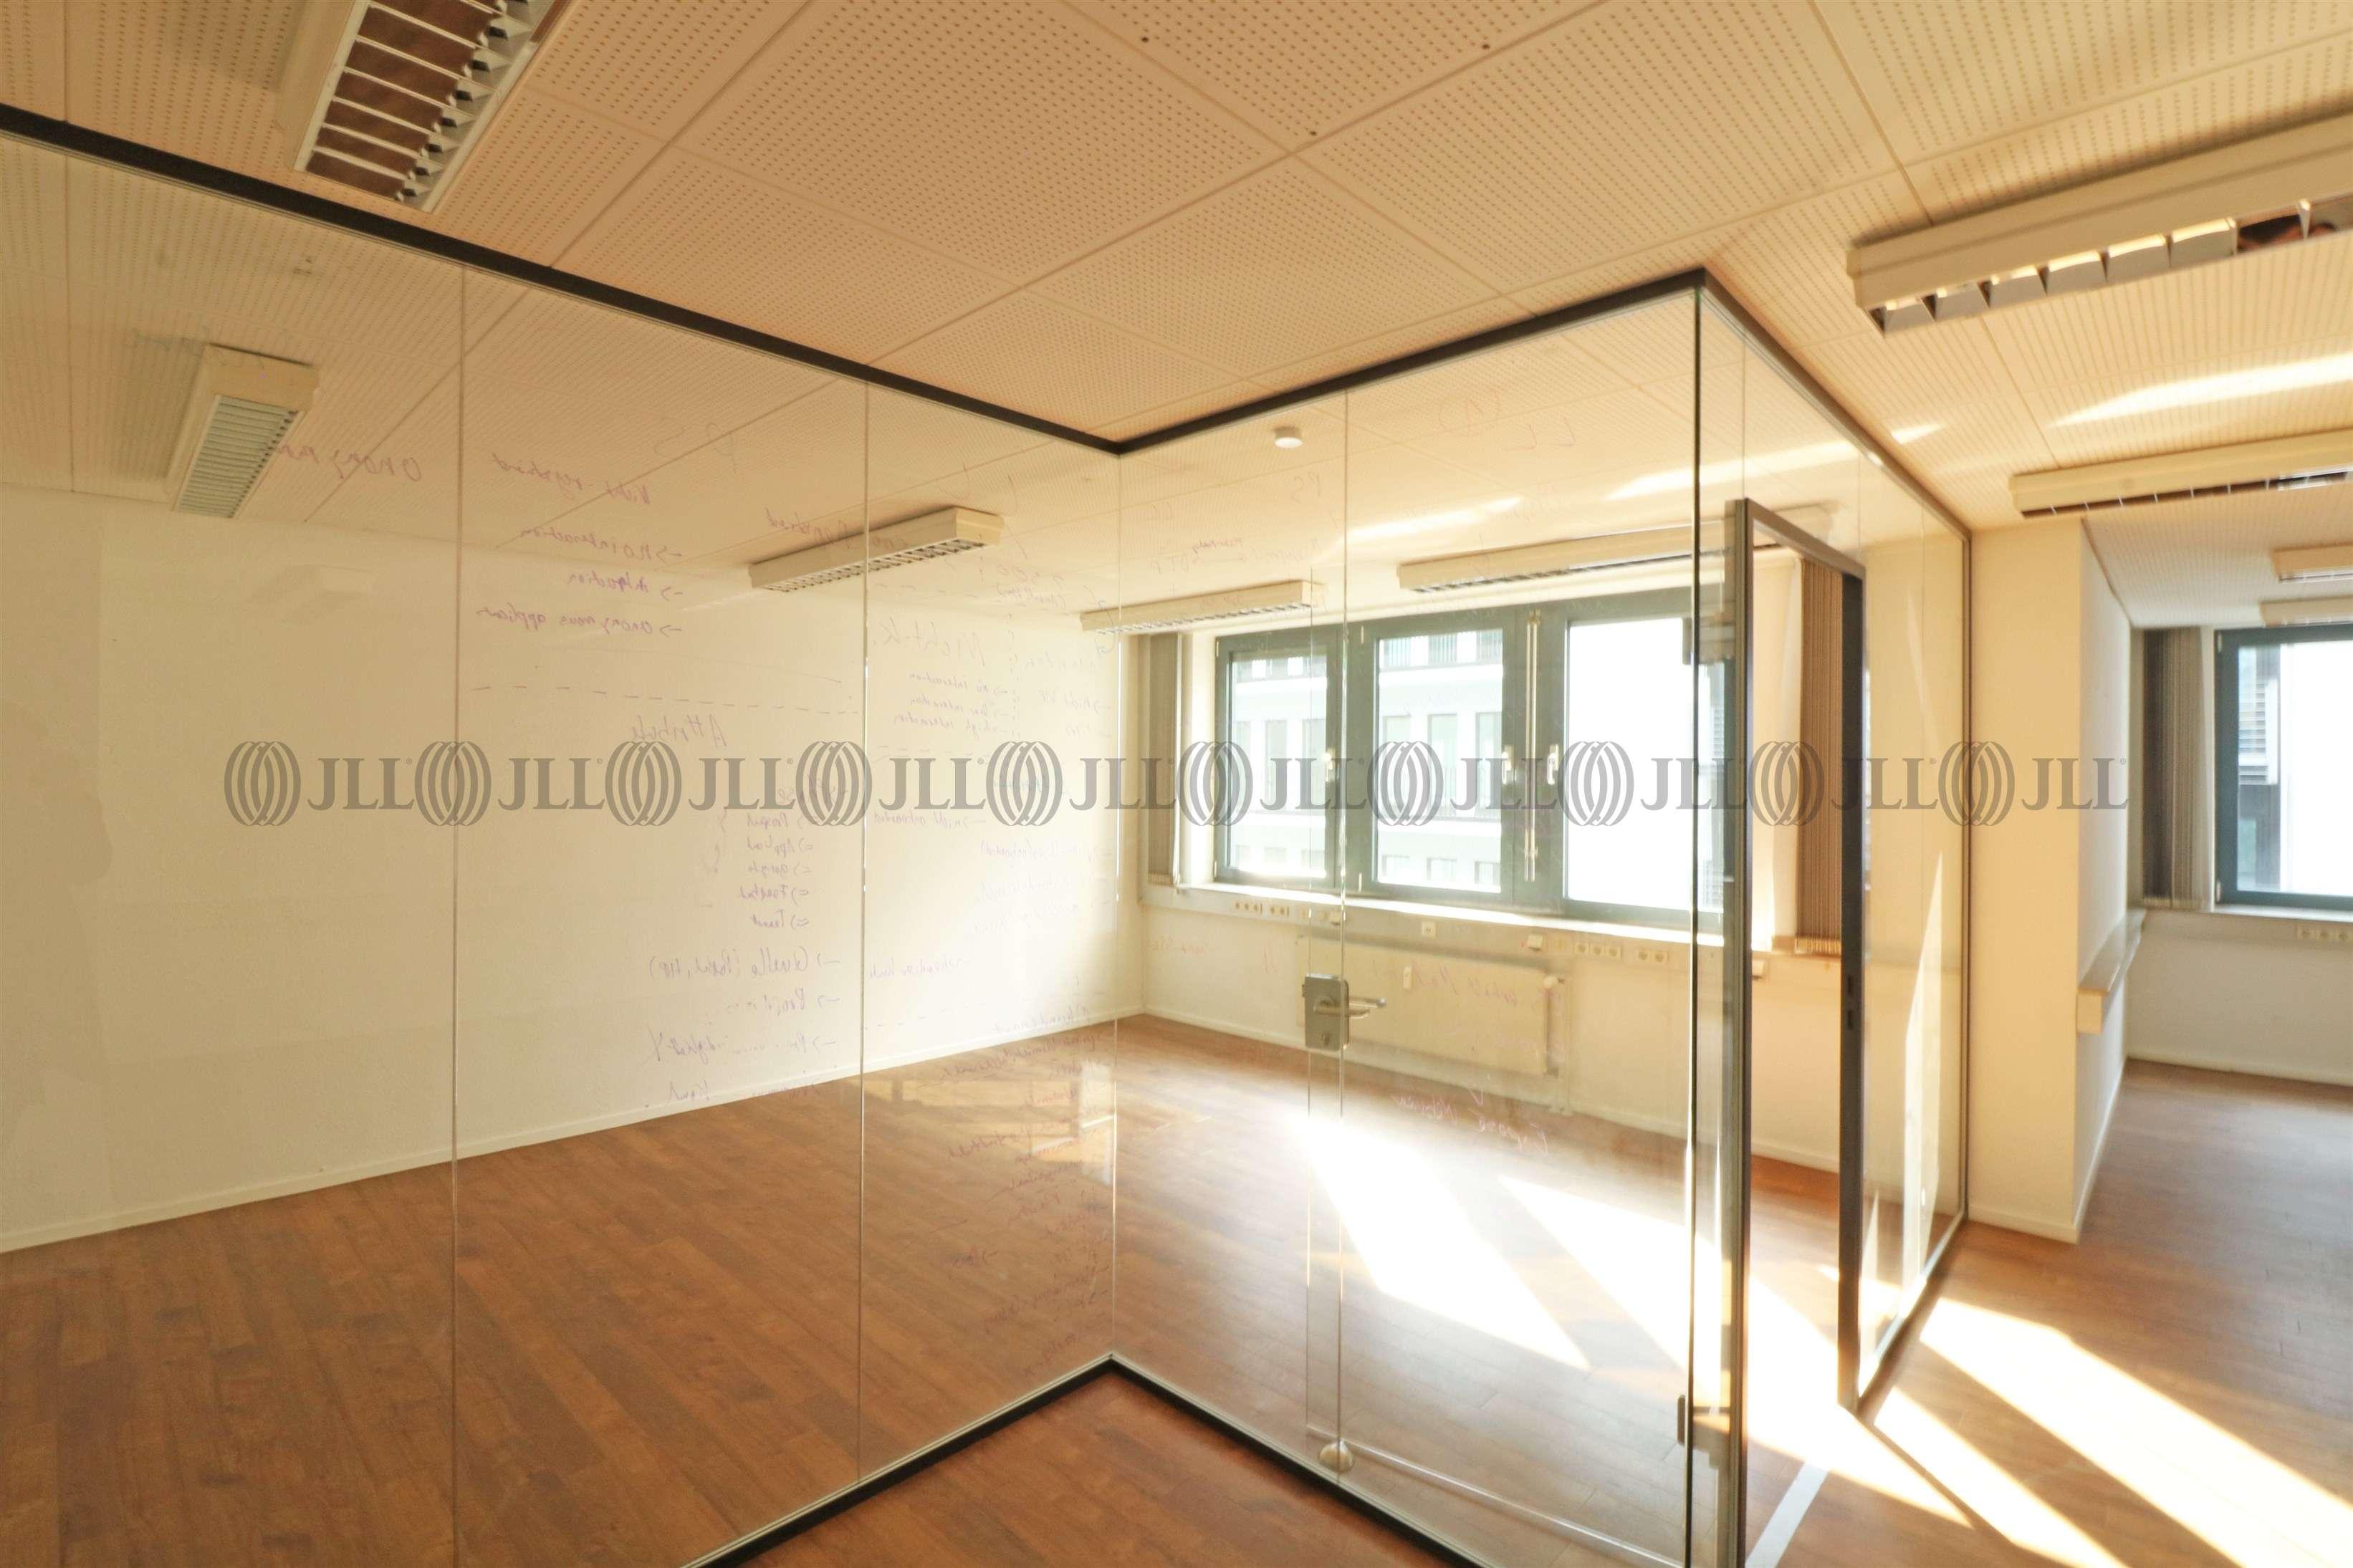 Büros Hamburg, 20457 - Büro - Hamburg, Altstadt - H0137 - 10043884